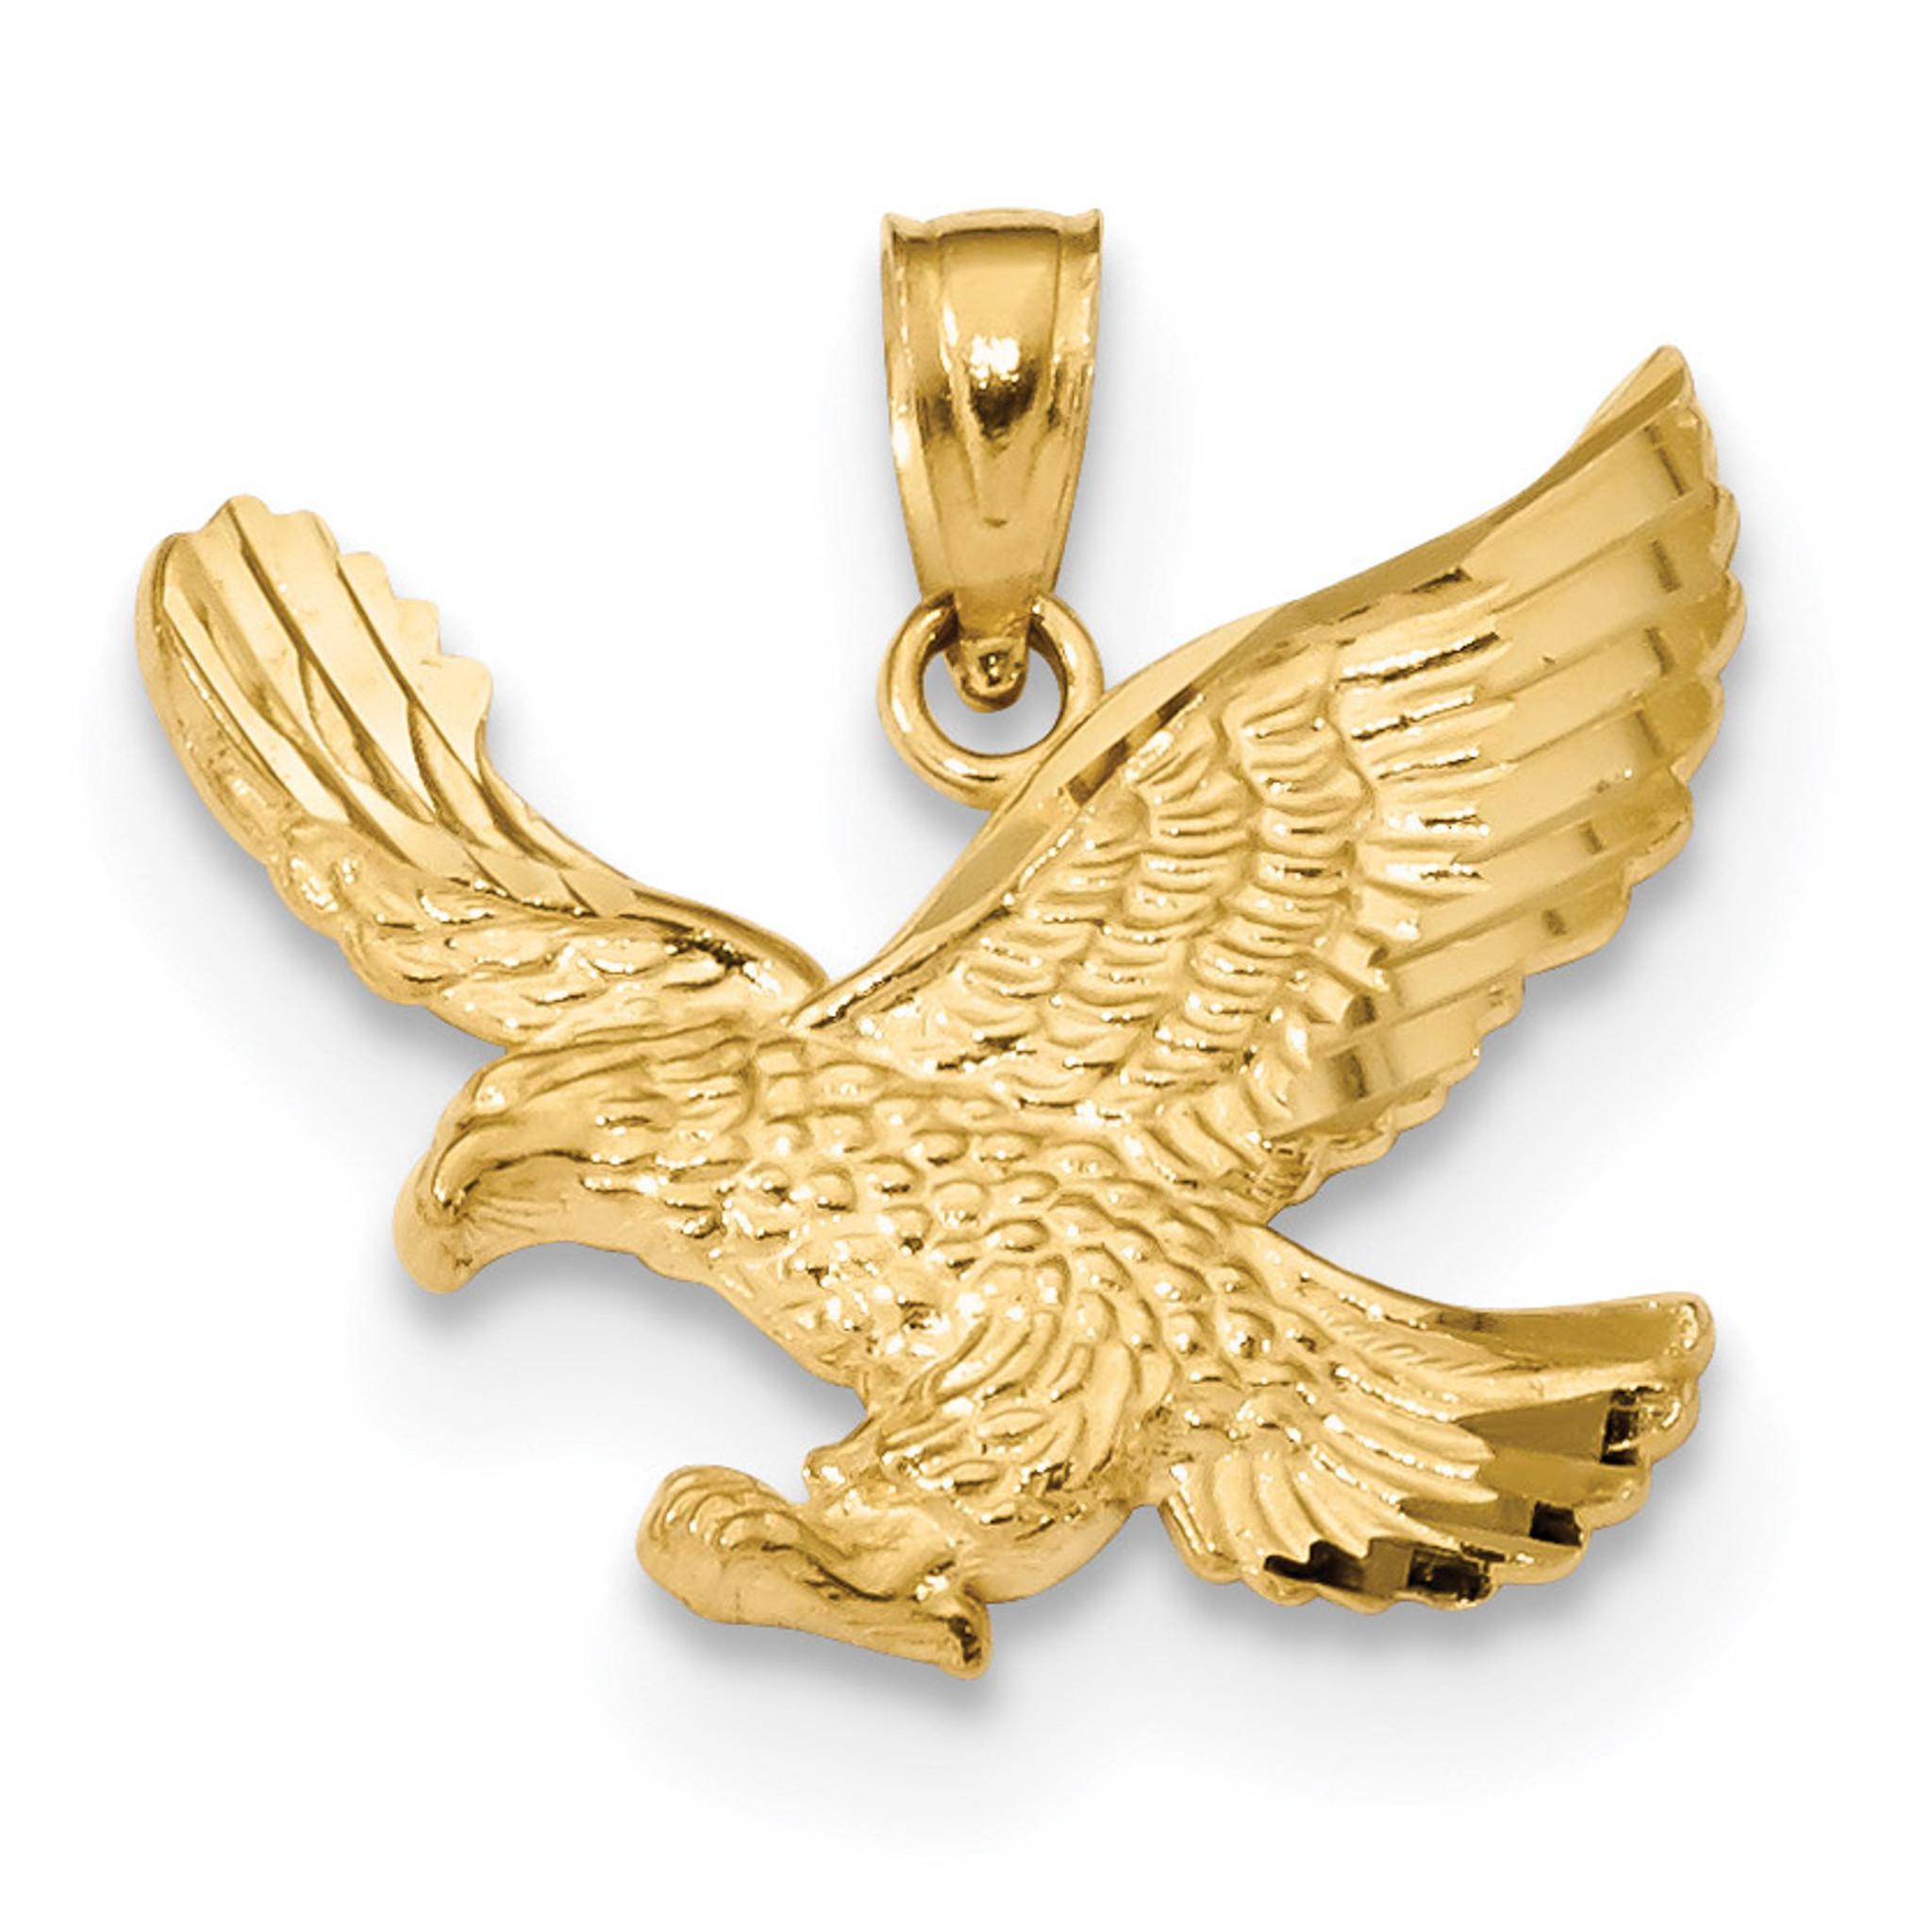 Eagle pendant 14k gold diamond cut k6000 homebello eagle pendant 14k gold diamond cut mpn k6000 aloadofball Gallery